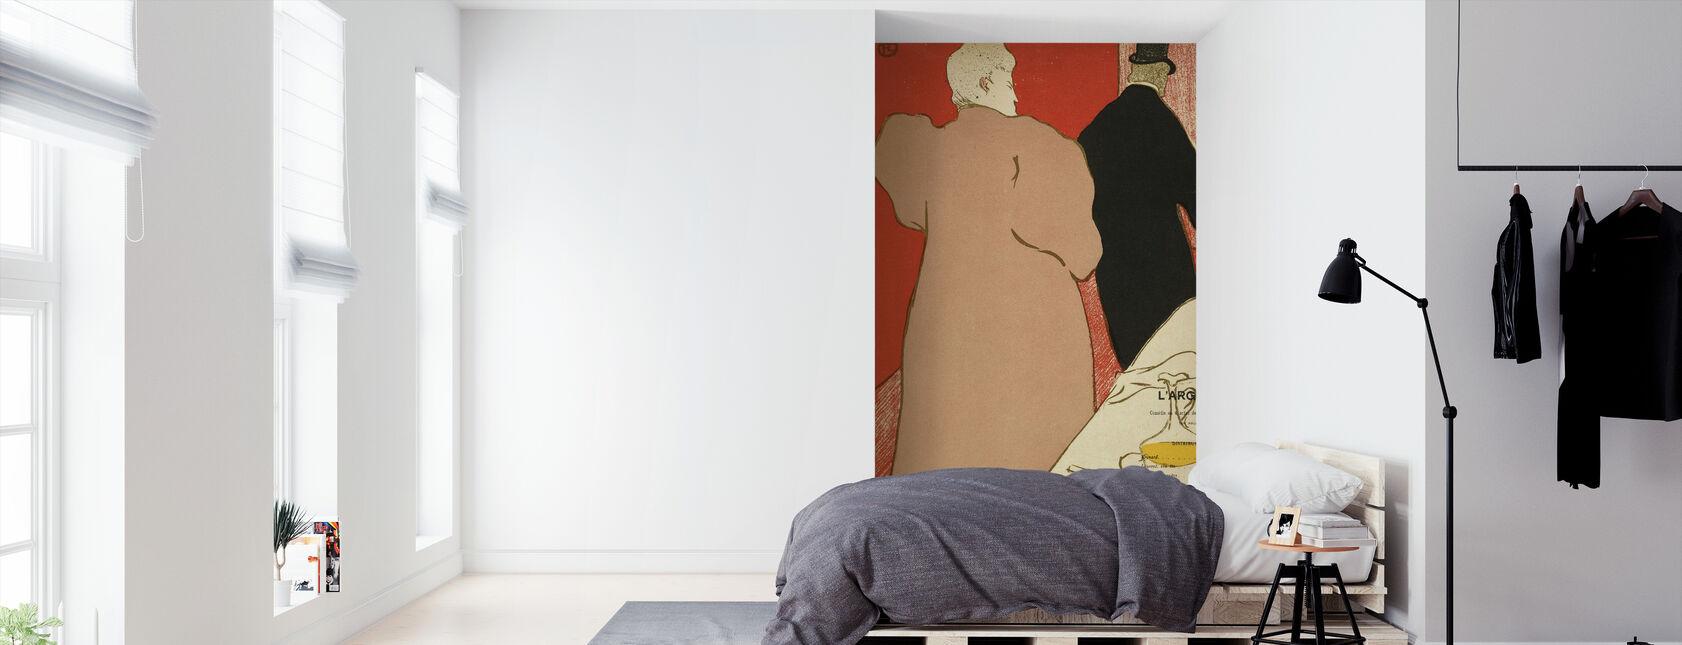 The Silver - Emile Fabre - Wallpaper - Bedroom